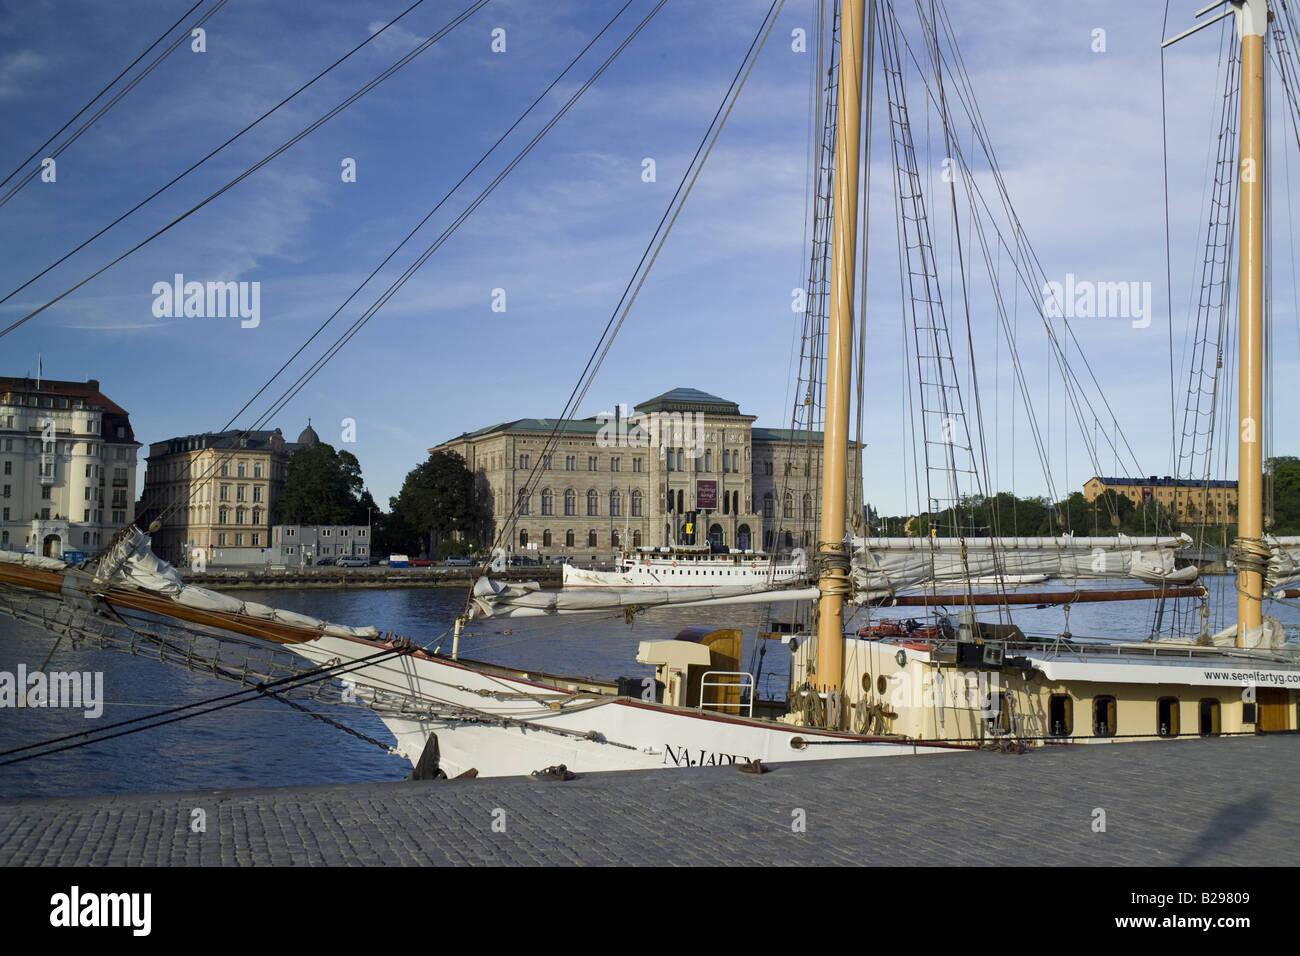 Gamla Stan Stockholm Sweden Ref WP TARU 000729 015 Date COMPULSORY CREDIT World Pictures Photoshot - Stock Image